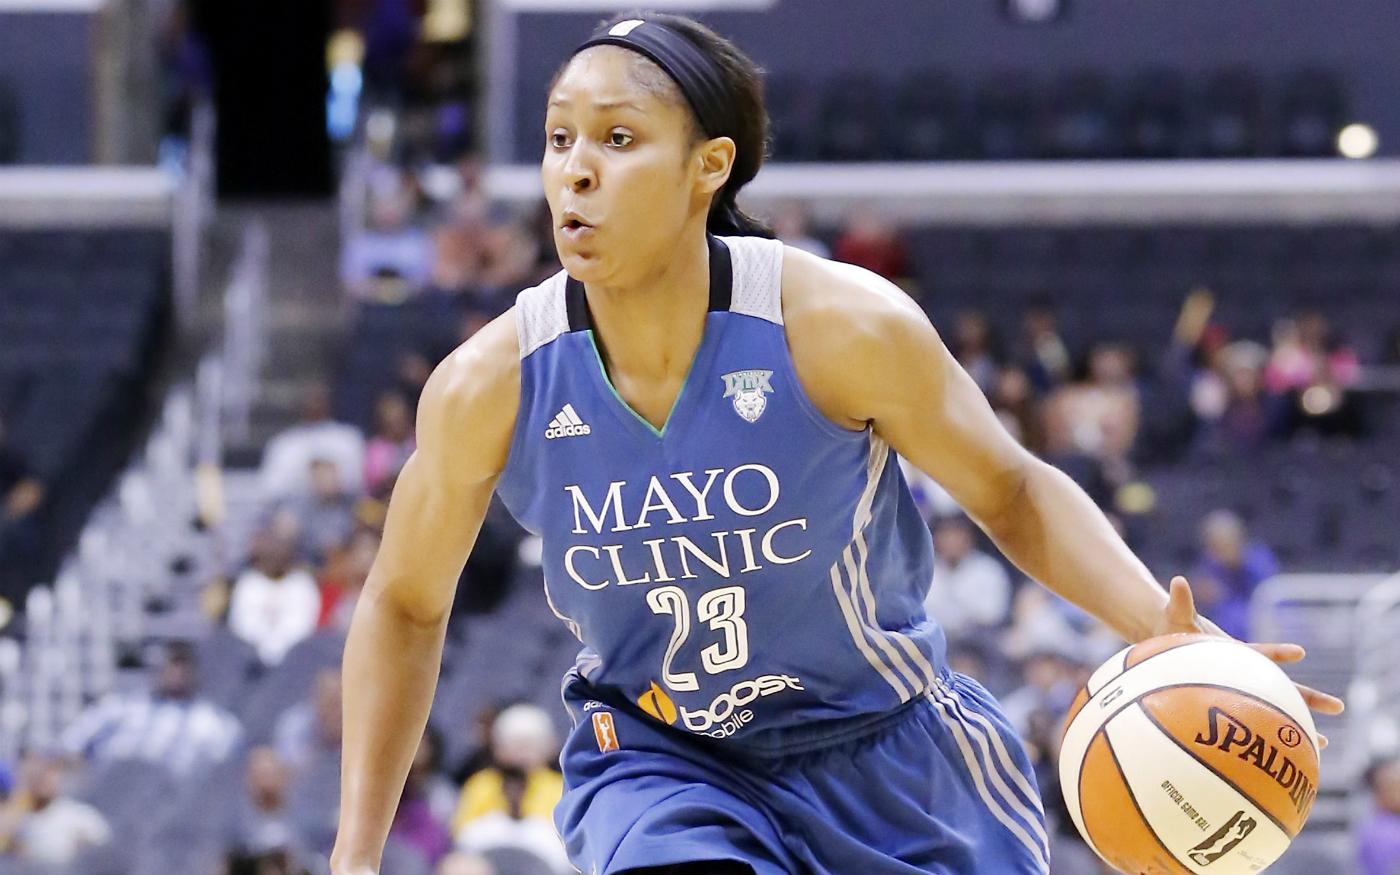 La WNBA séduit enfin !